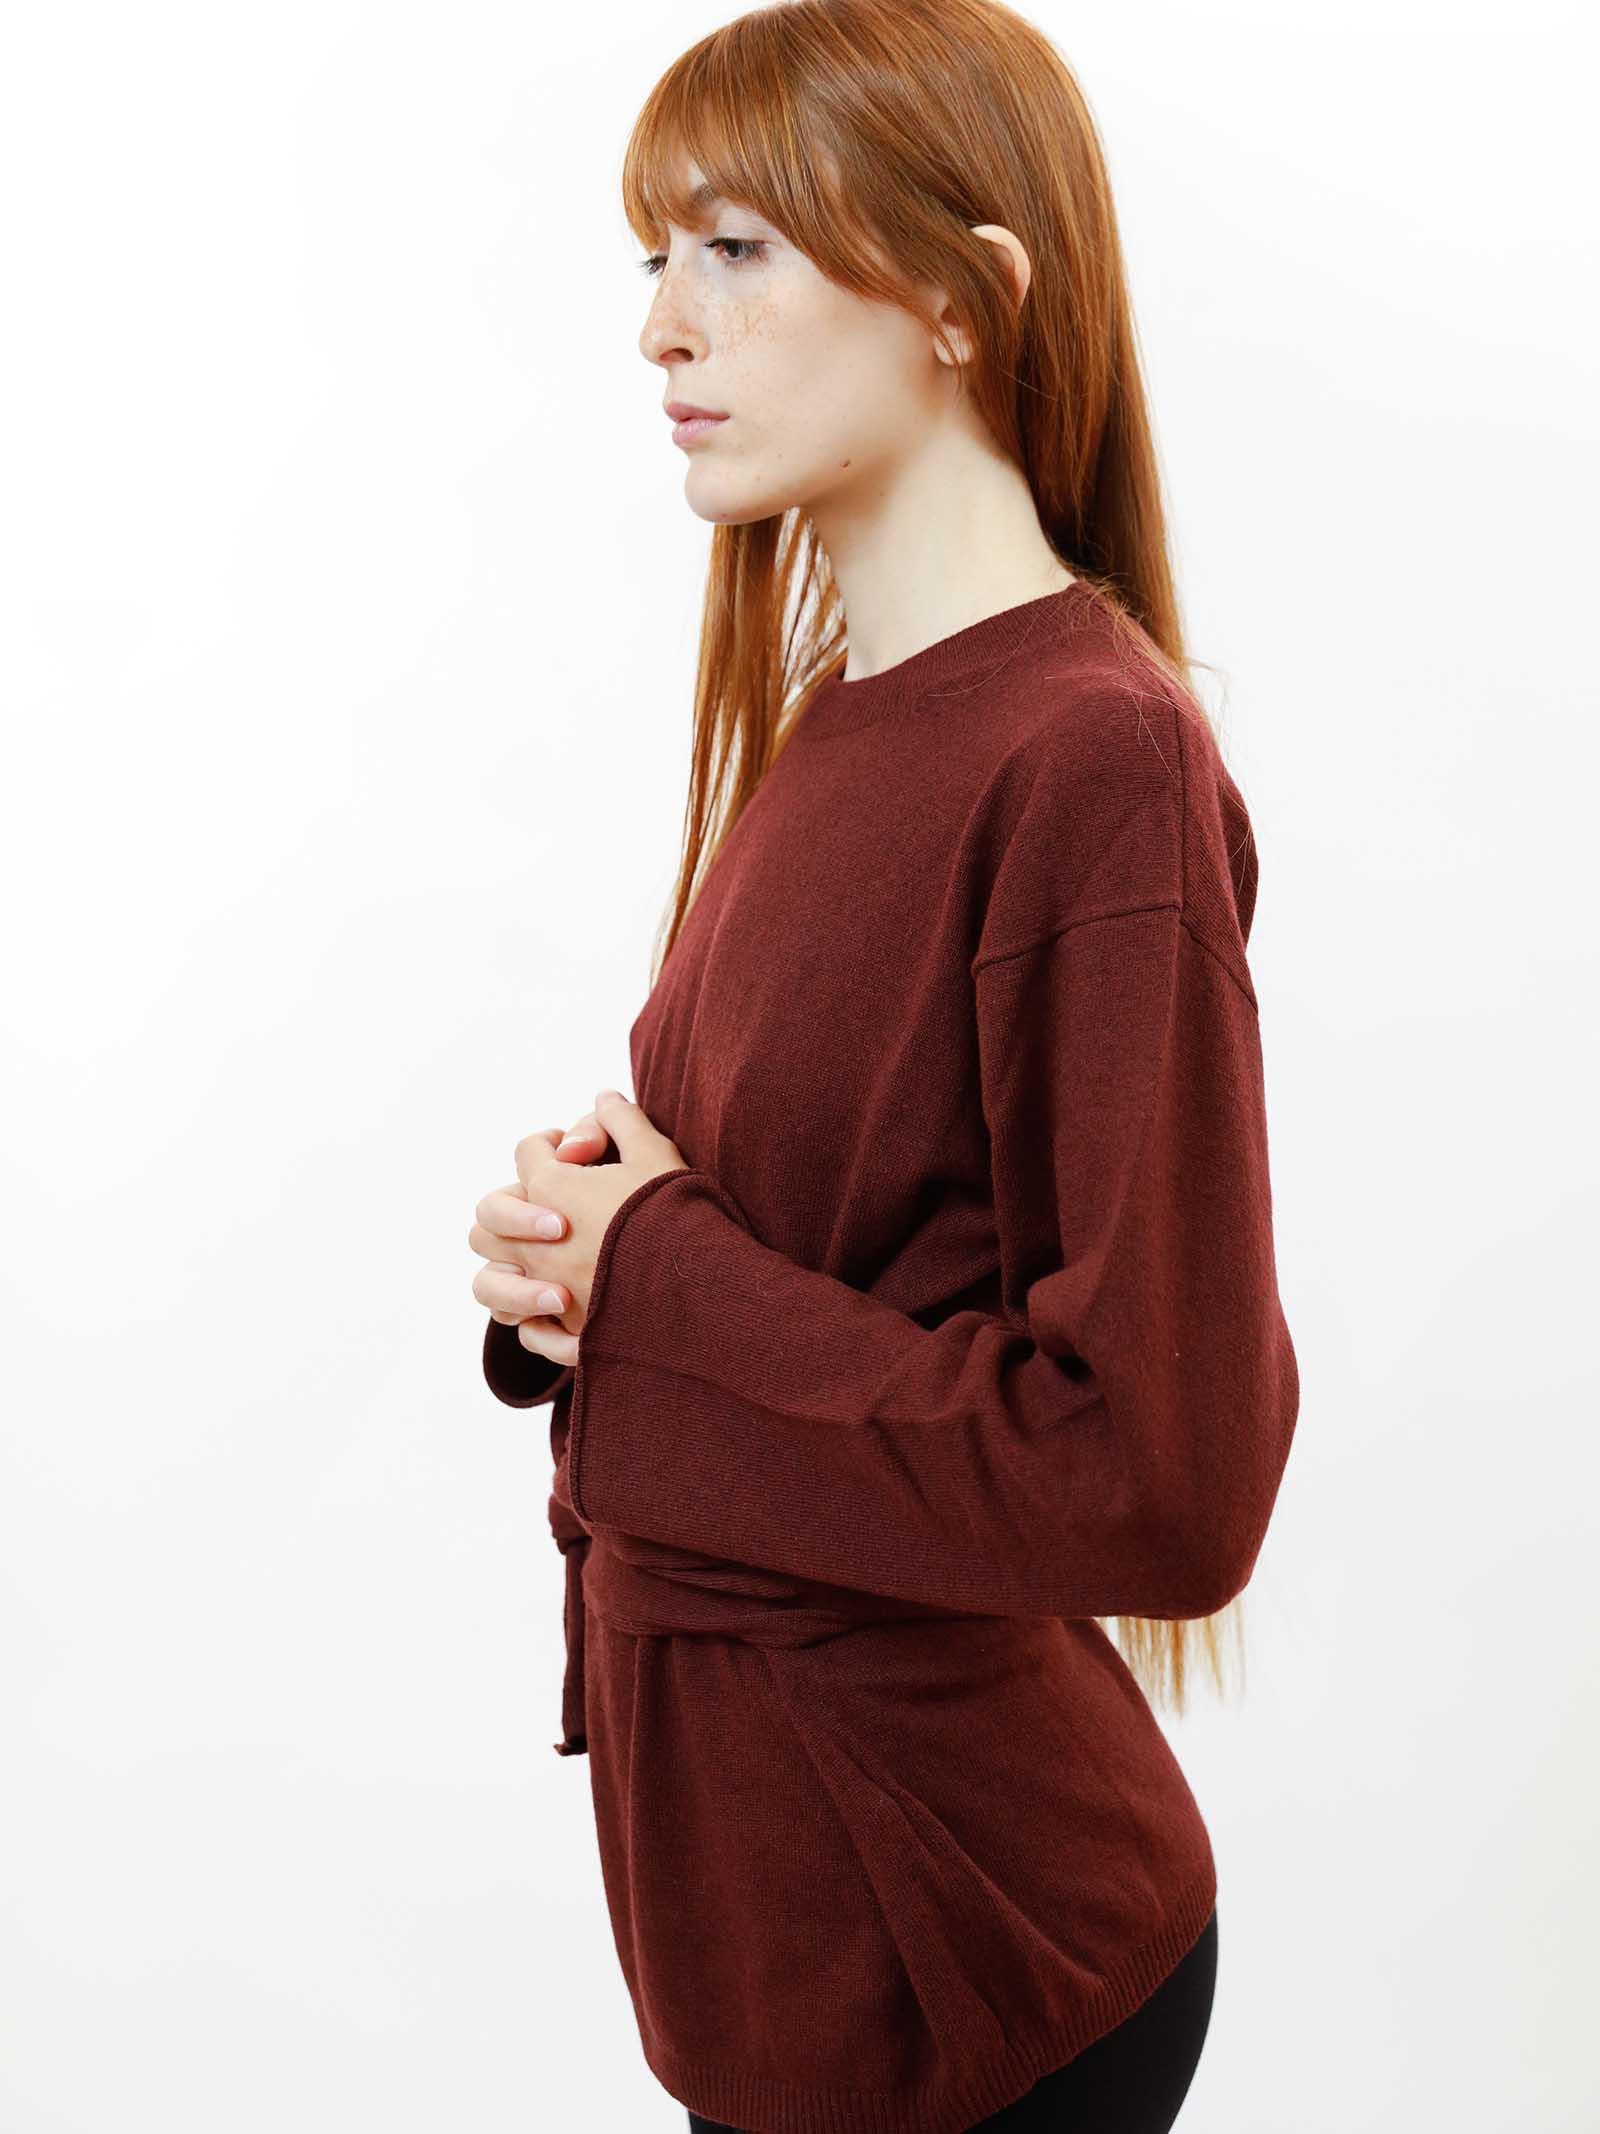 Women's Clothing Re-volution Sweater in Burgundy Wool Crew-Neck with Matching Waist Belt Maliparmi | Knitwear | JQ48987051833010